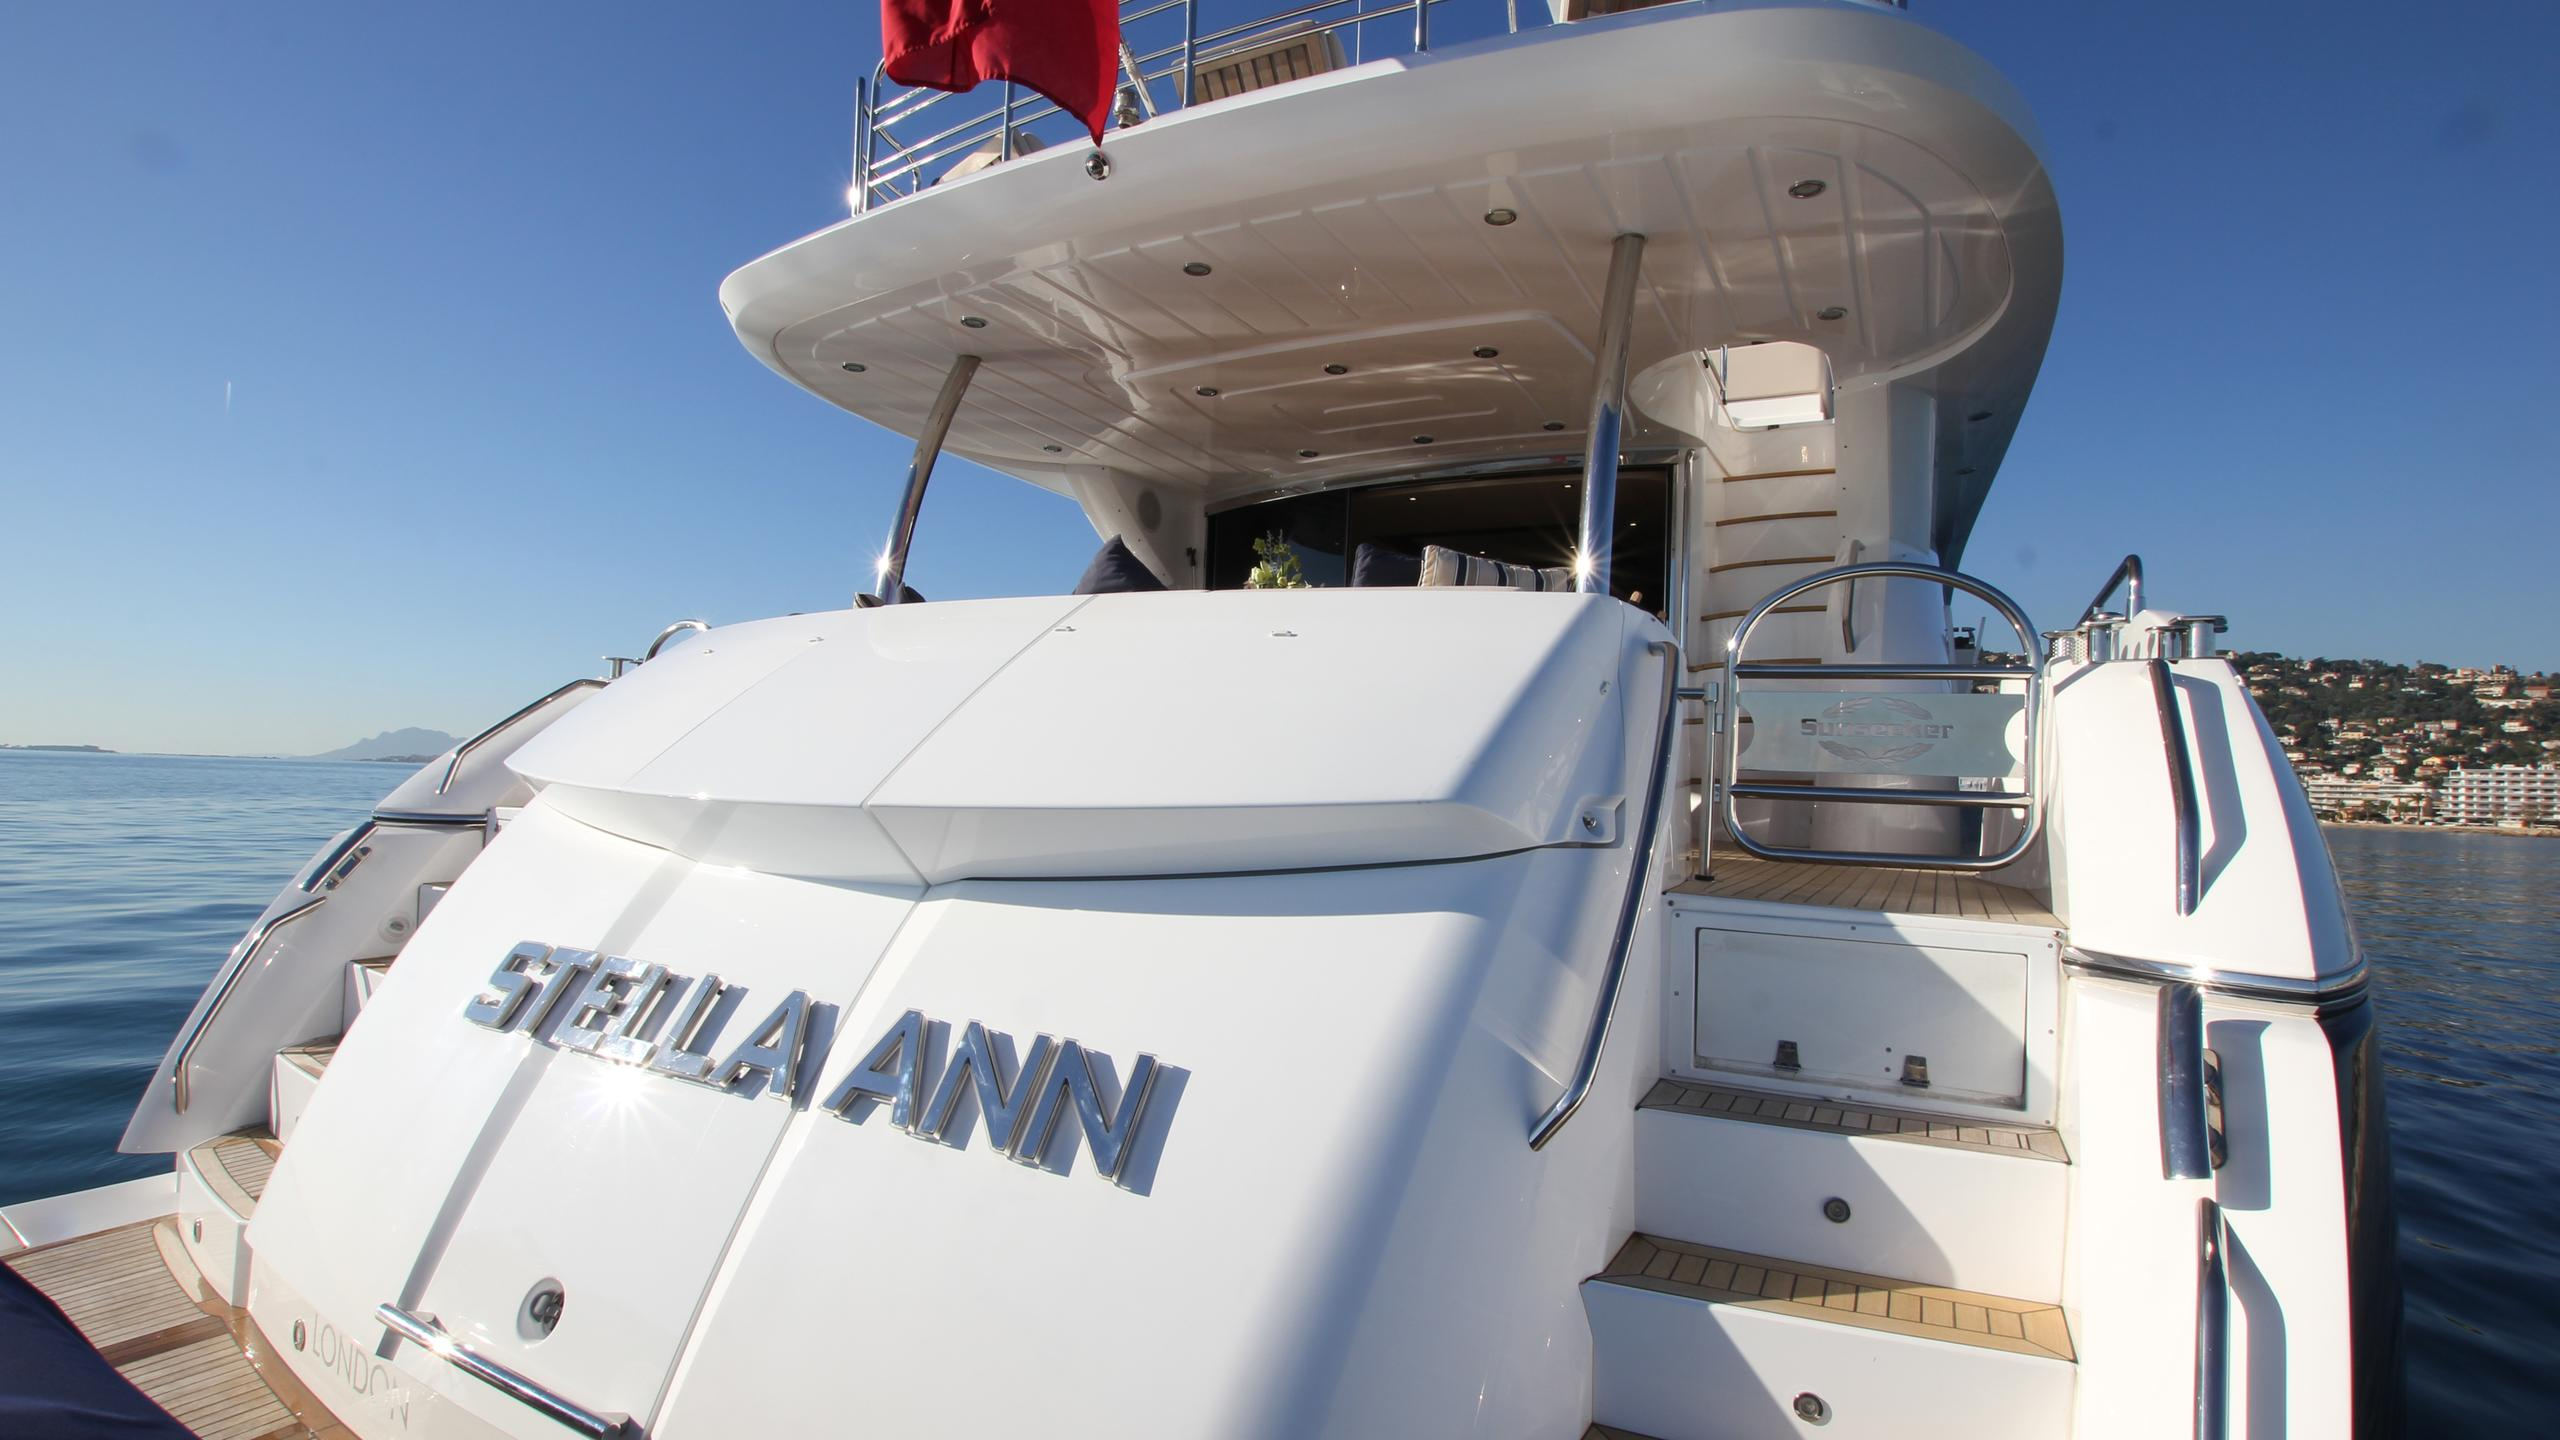 stella-ann-yacht-stern